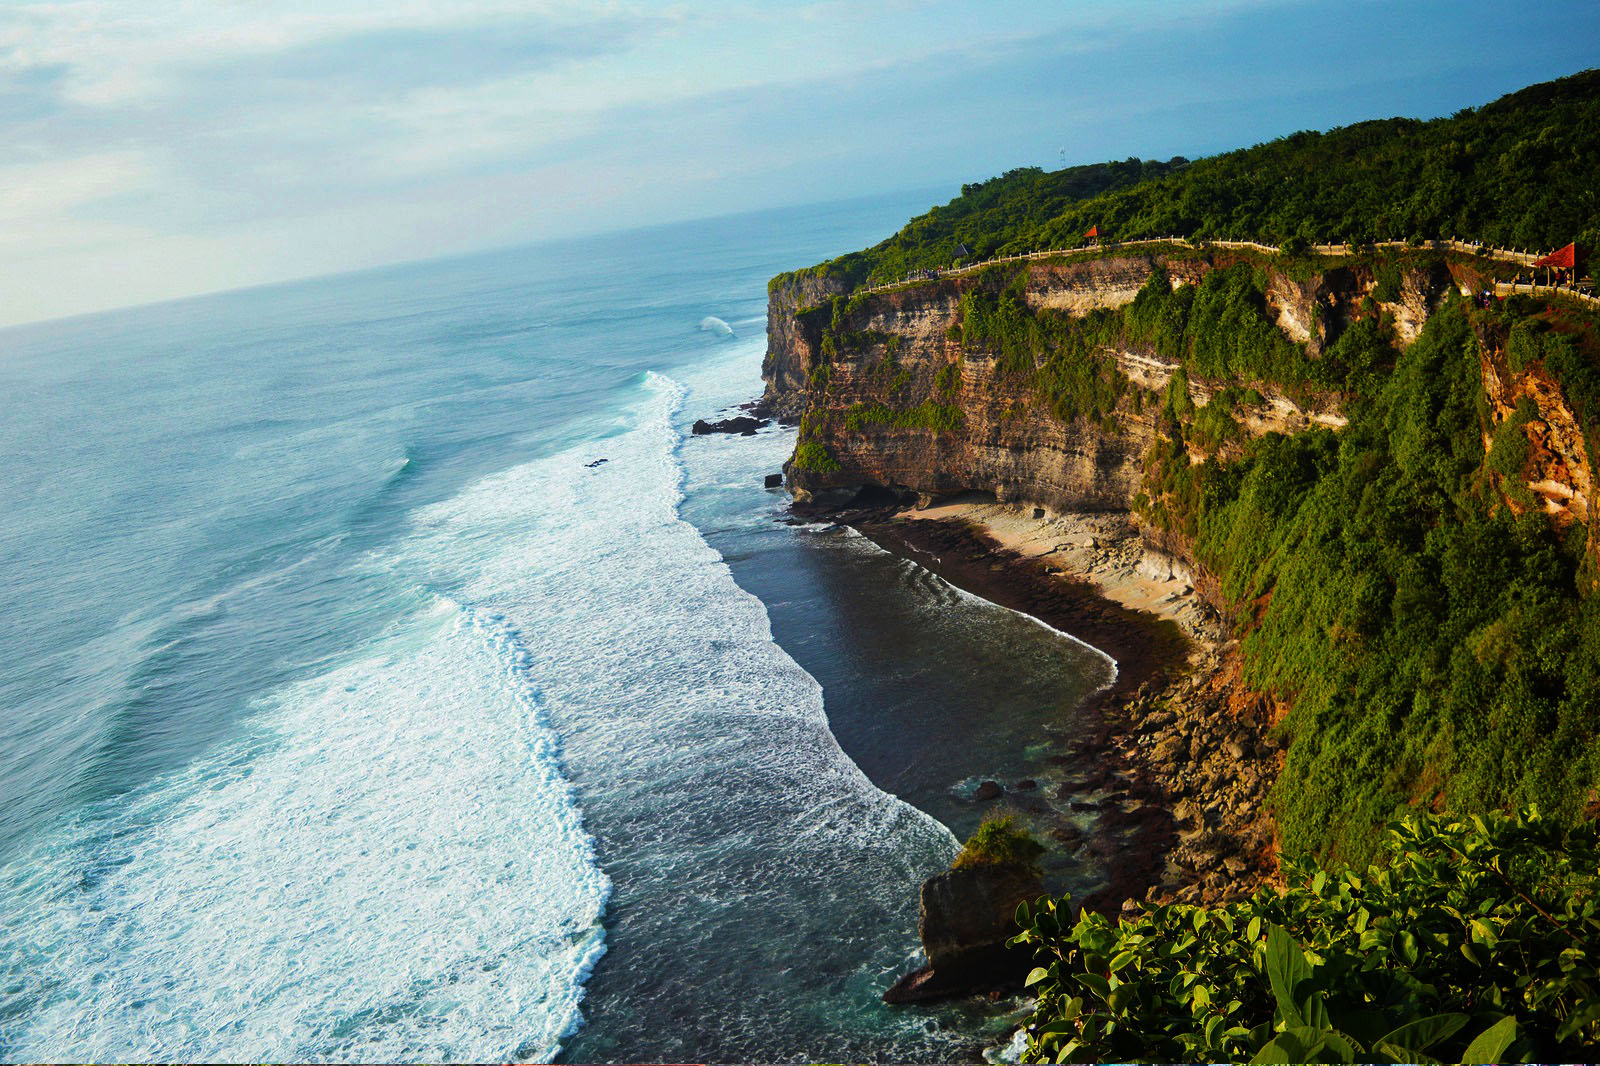 uluwatu - Bali Honeymoon package - Bali Tour Packages, YOEXPLORE